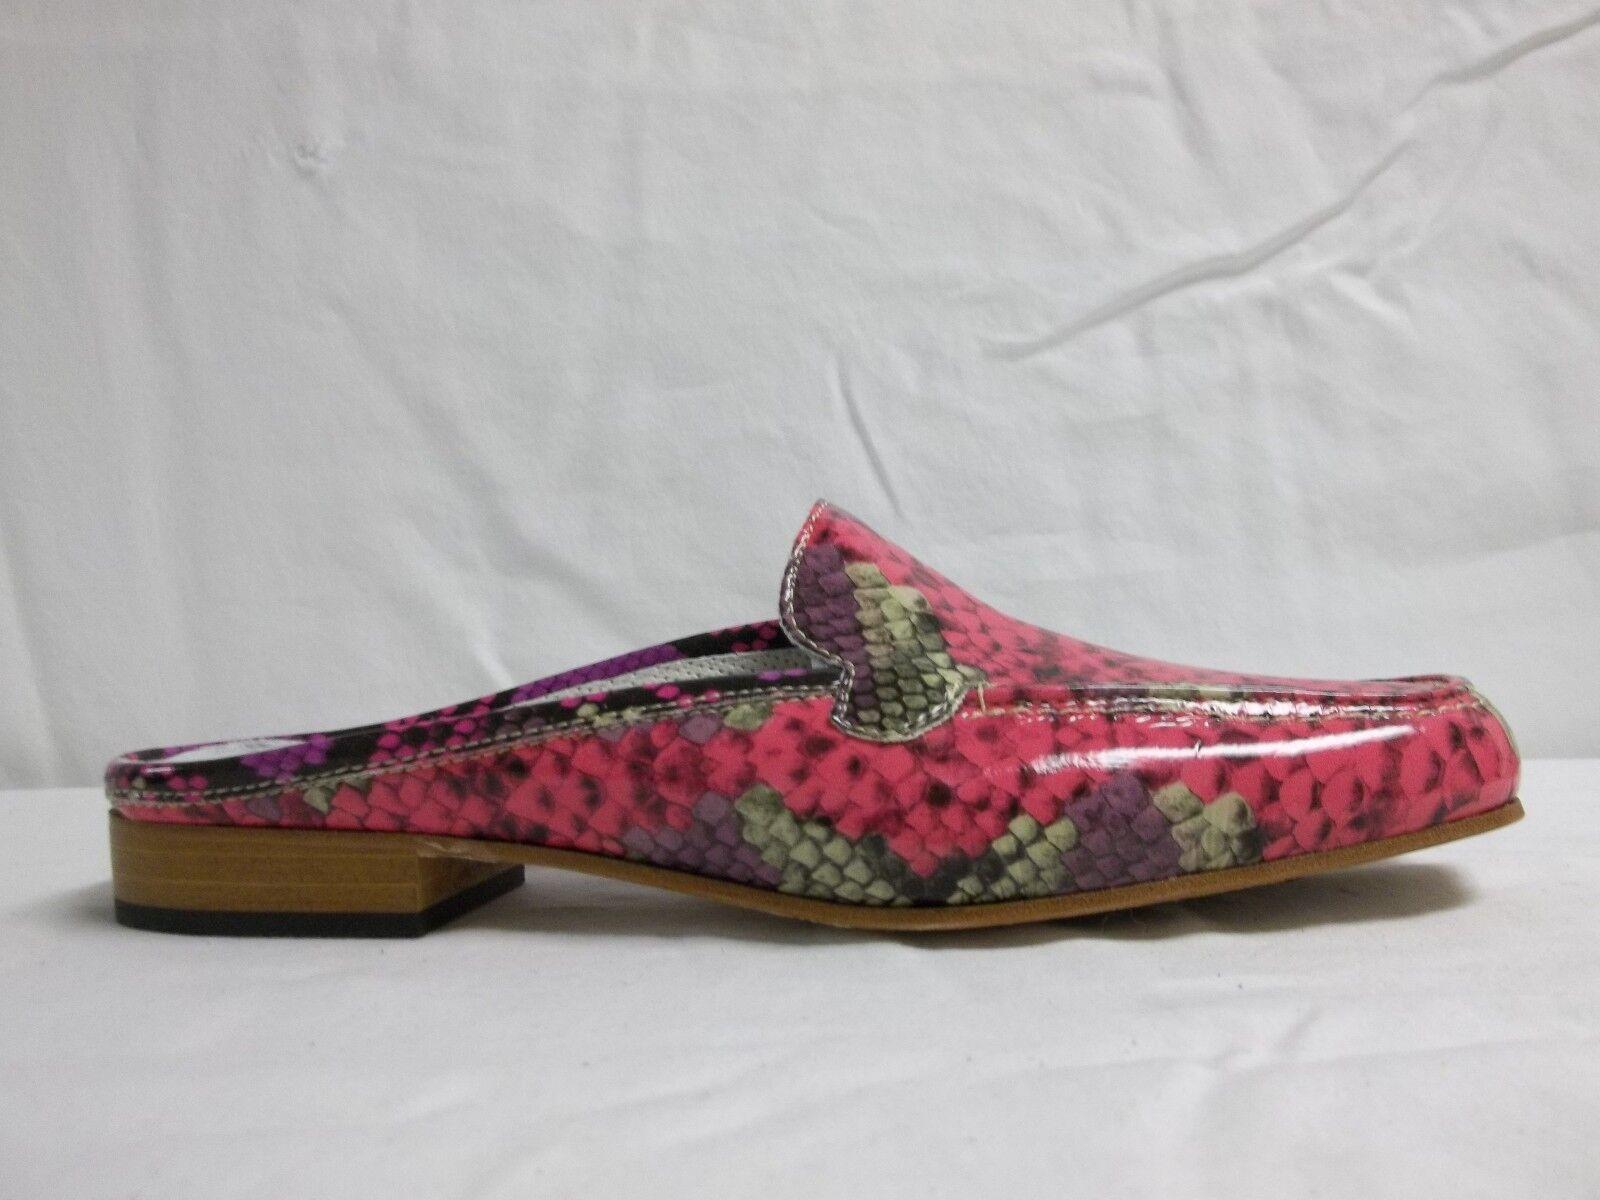 Sesto Meucci Größe Größe Größe 8.5 M Moyna Magenta Leder Slides New Damenschuhe Schuhes NWOB 963889